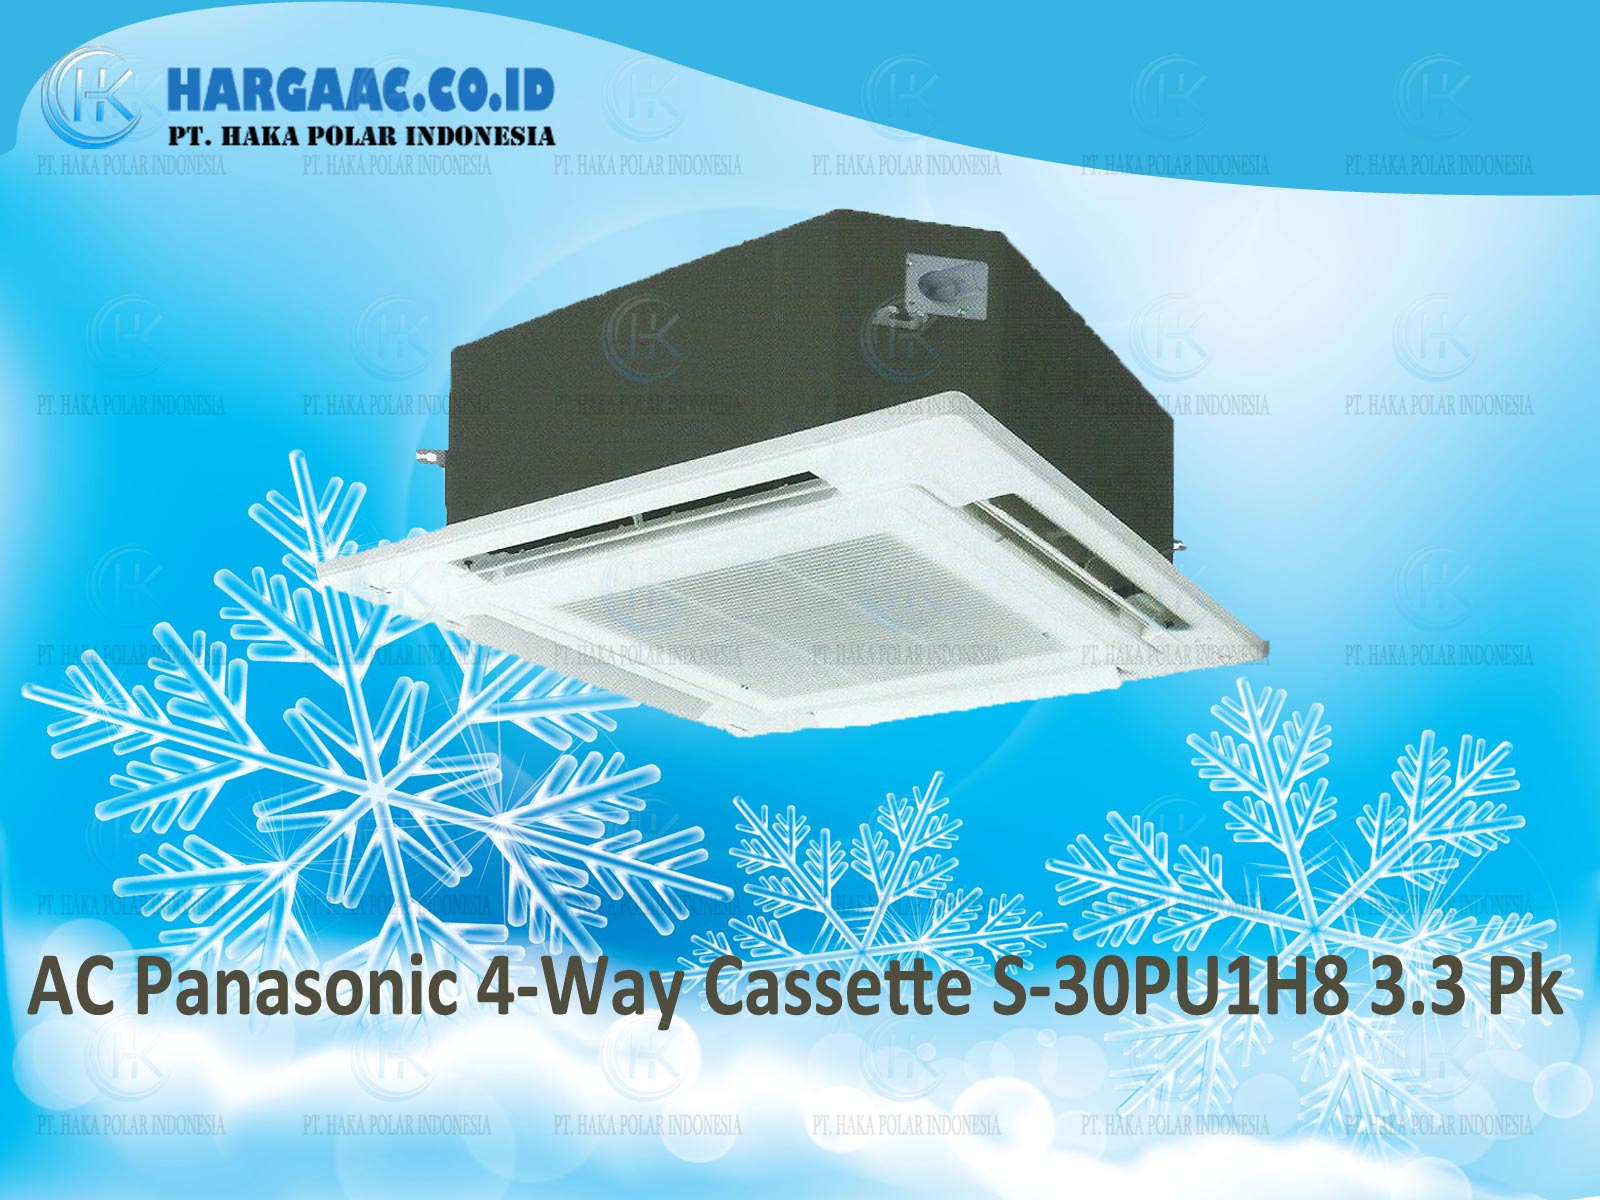 AC Panasonic 4-Way Cassette S-30PU1H8 3 Phase 3.3 PK R410a